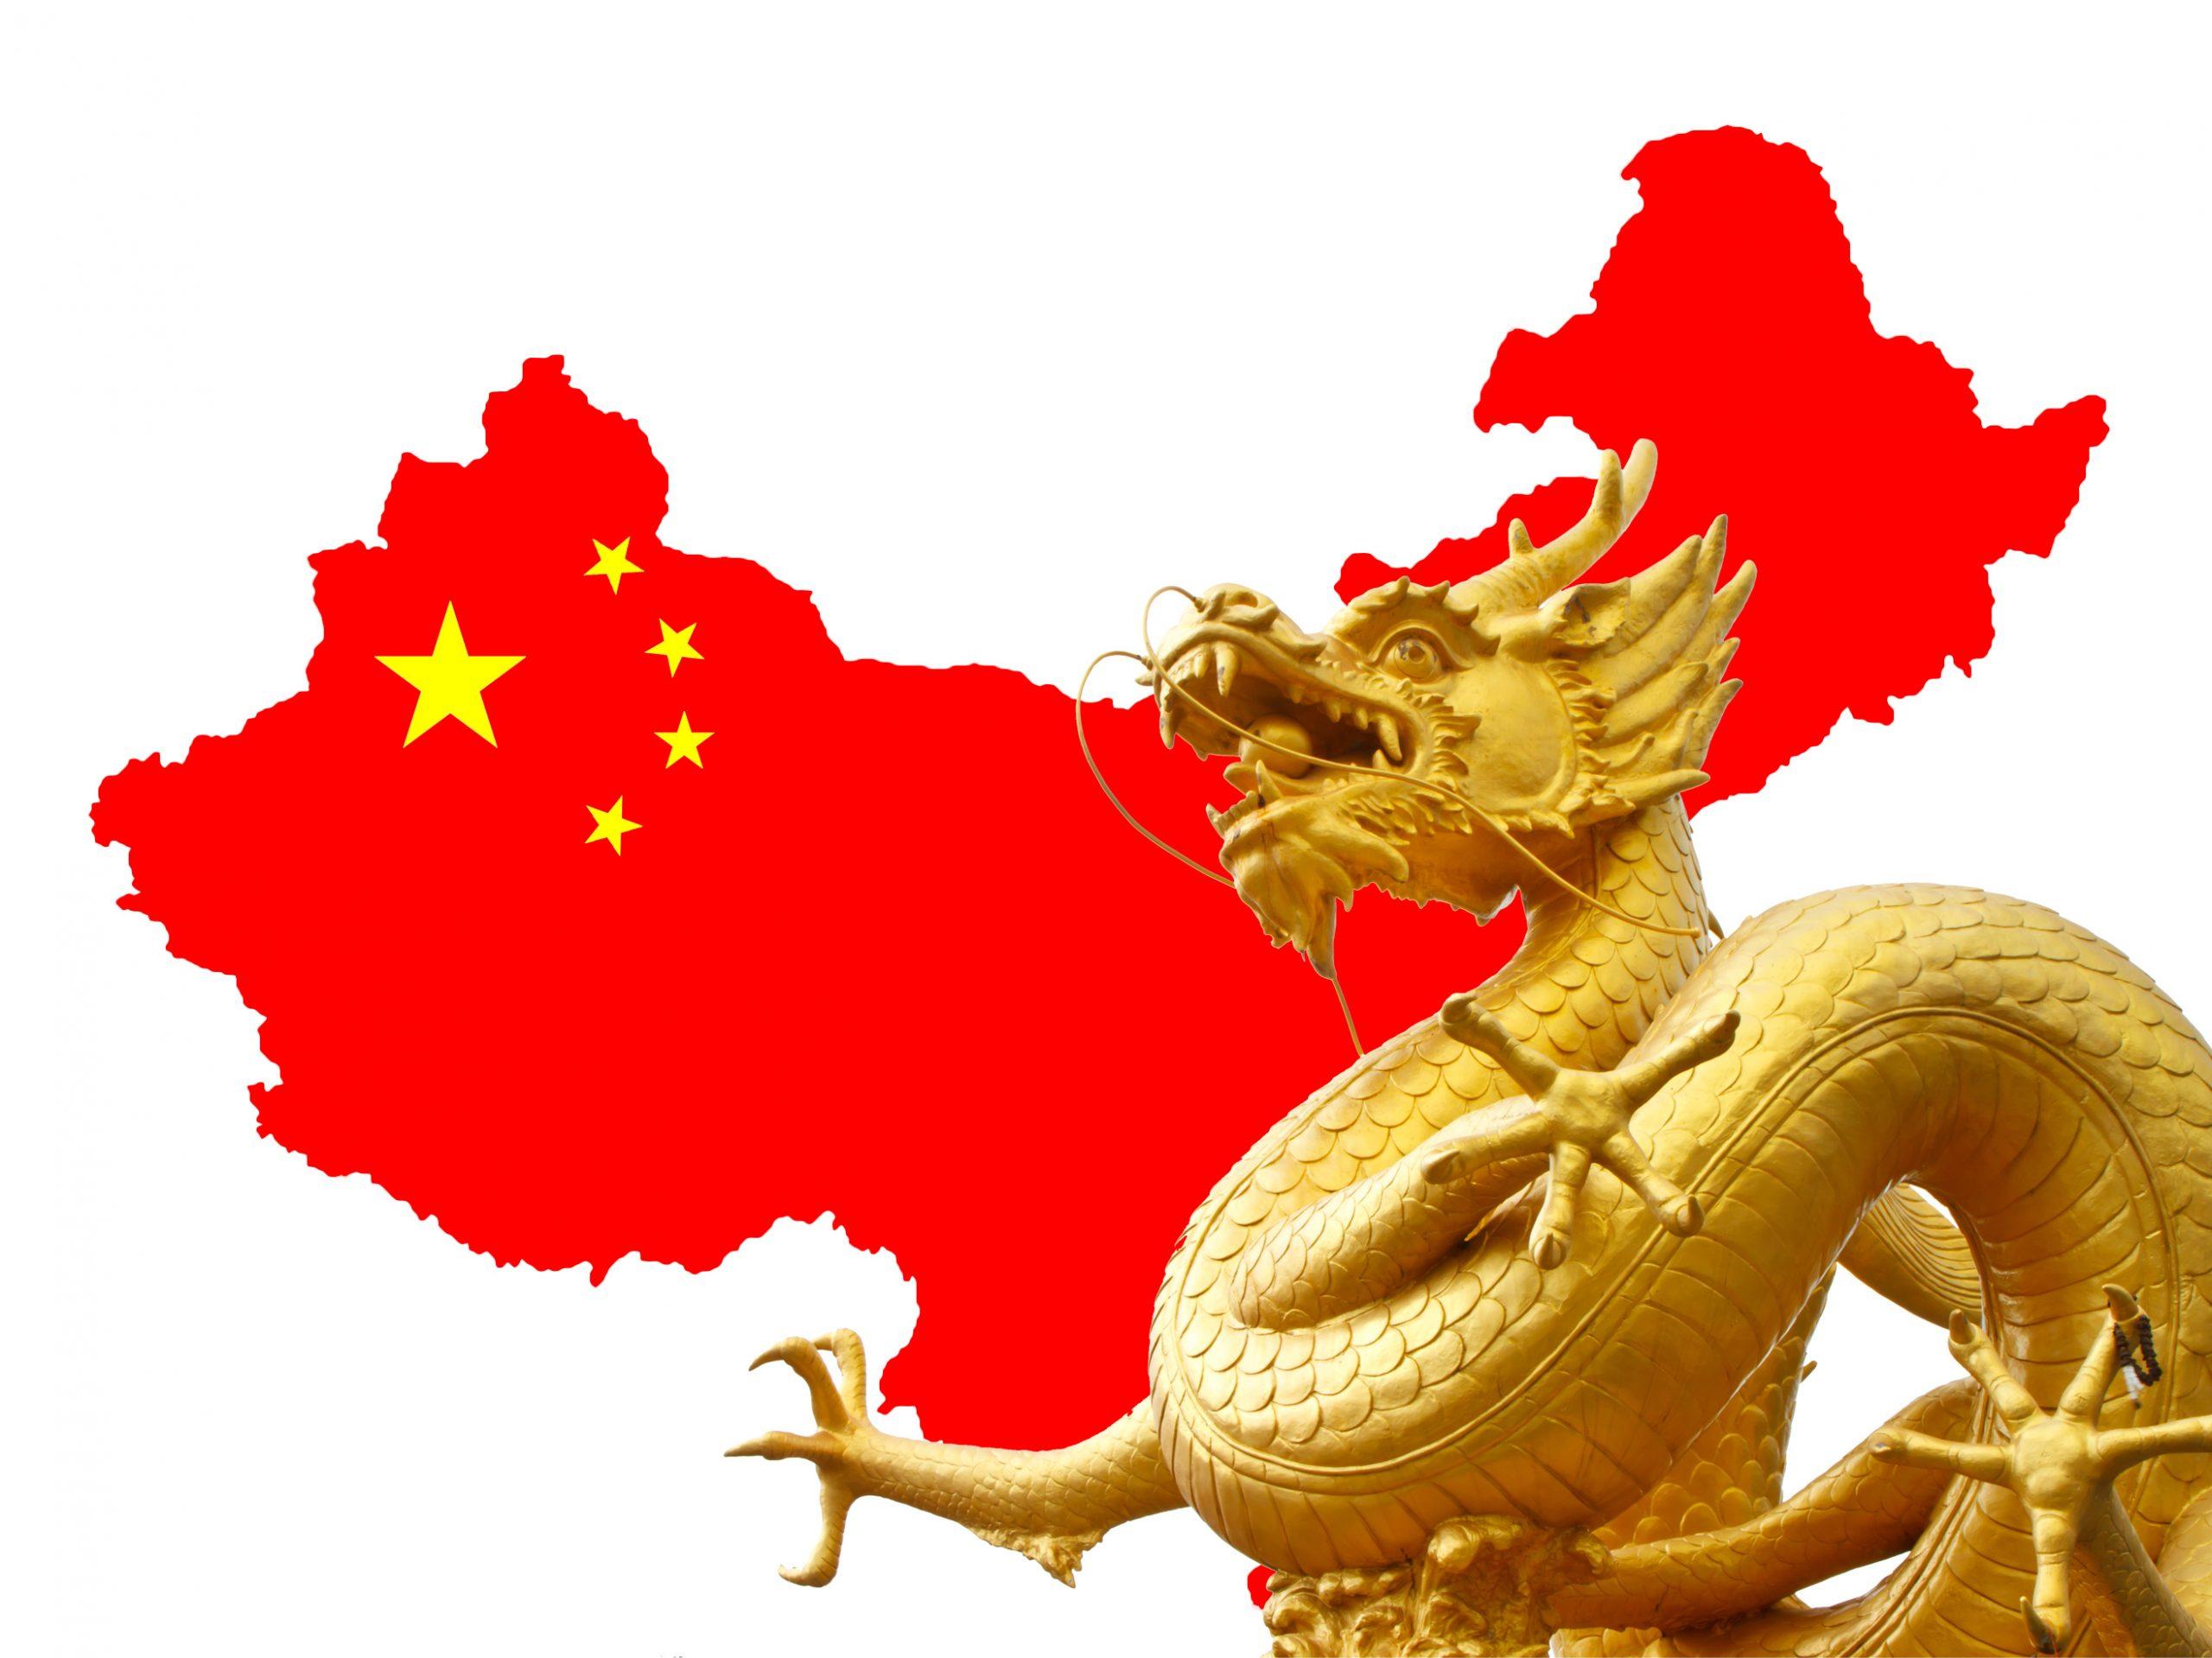 Taking Down the Dragon – How to Contain China in Post-Coronavirus World